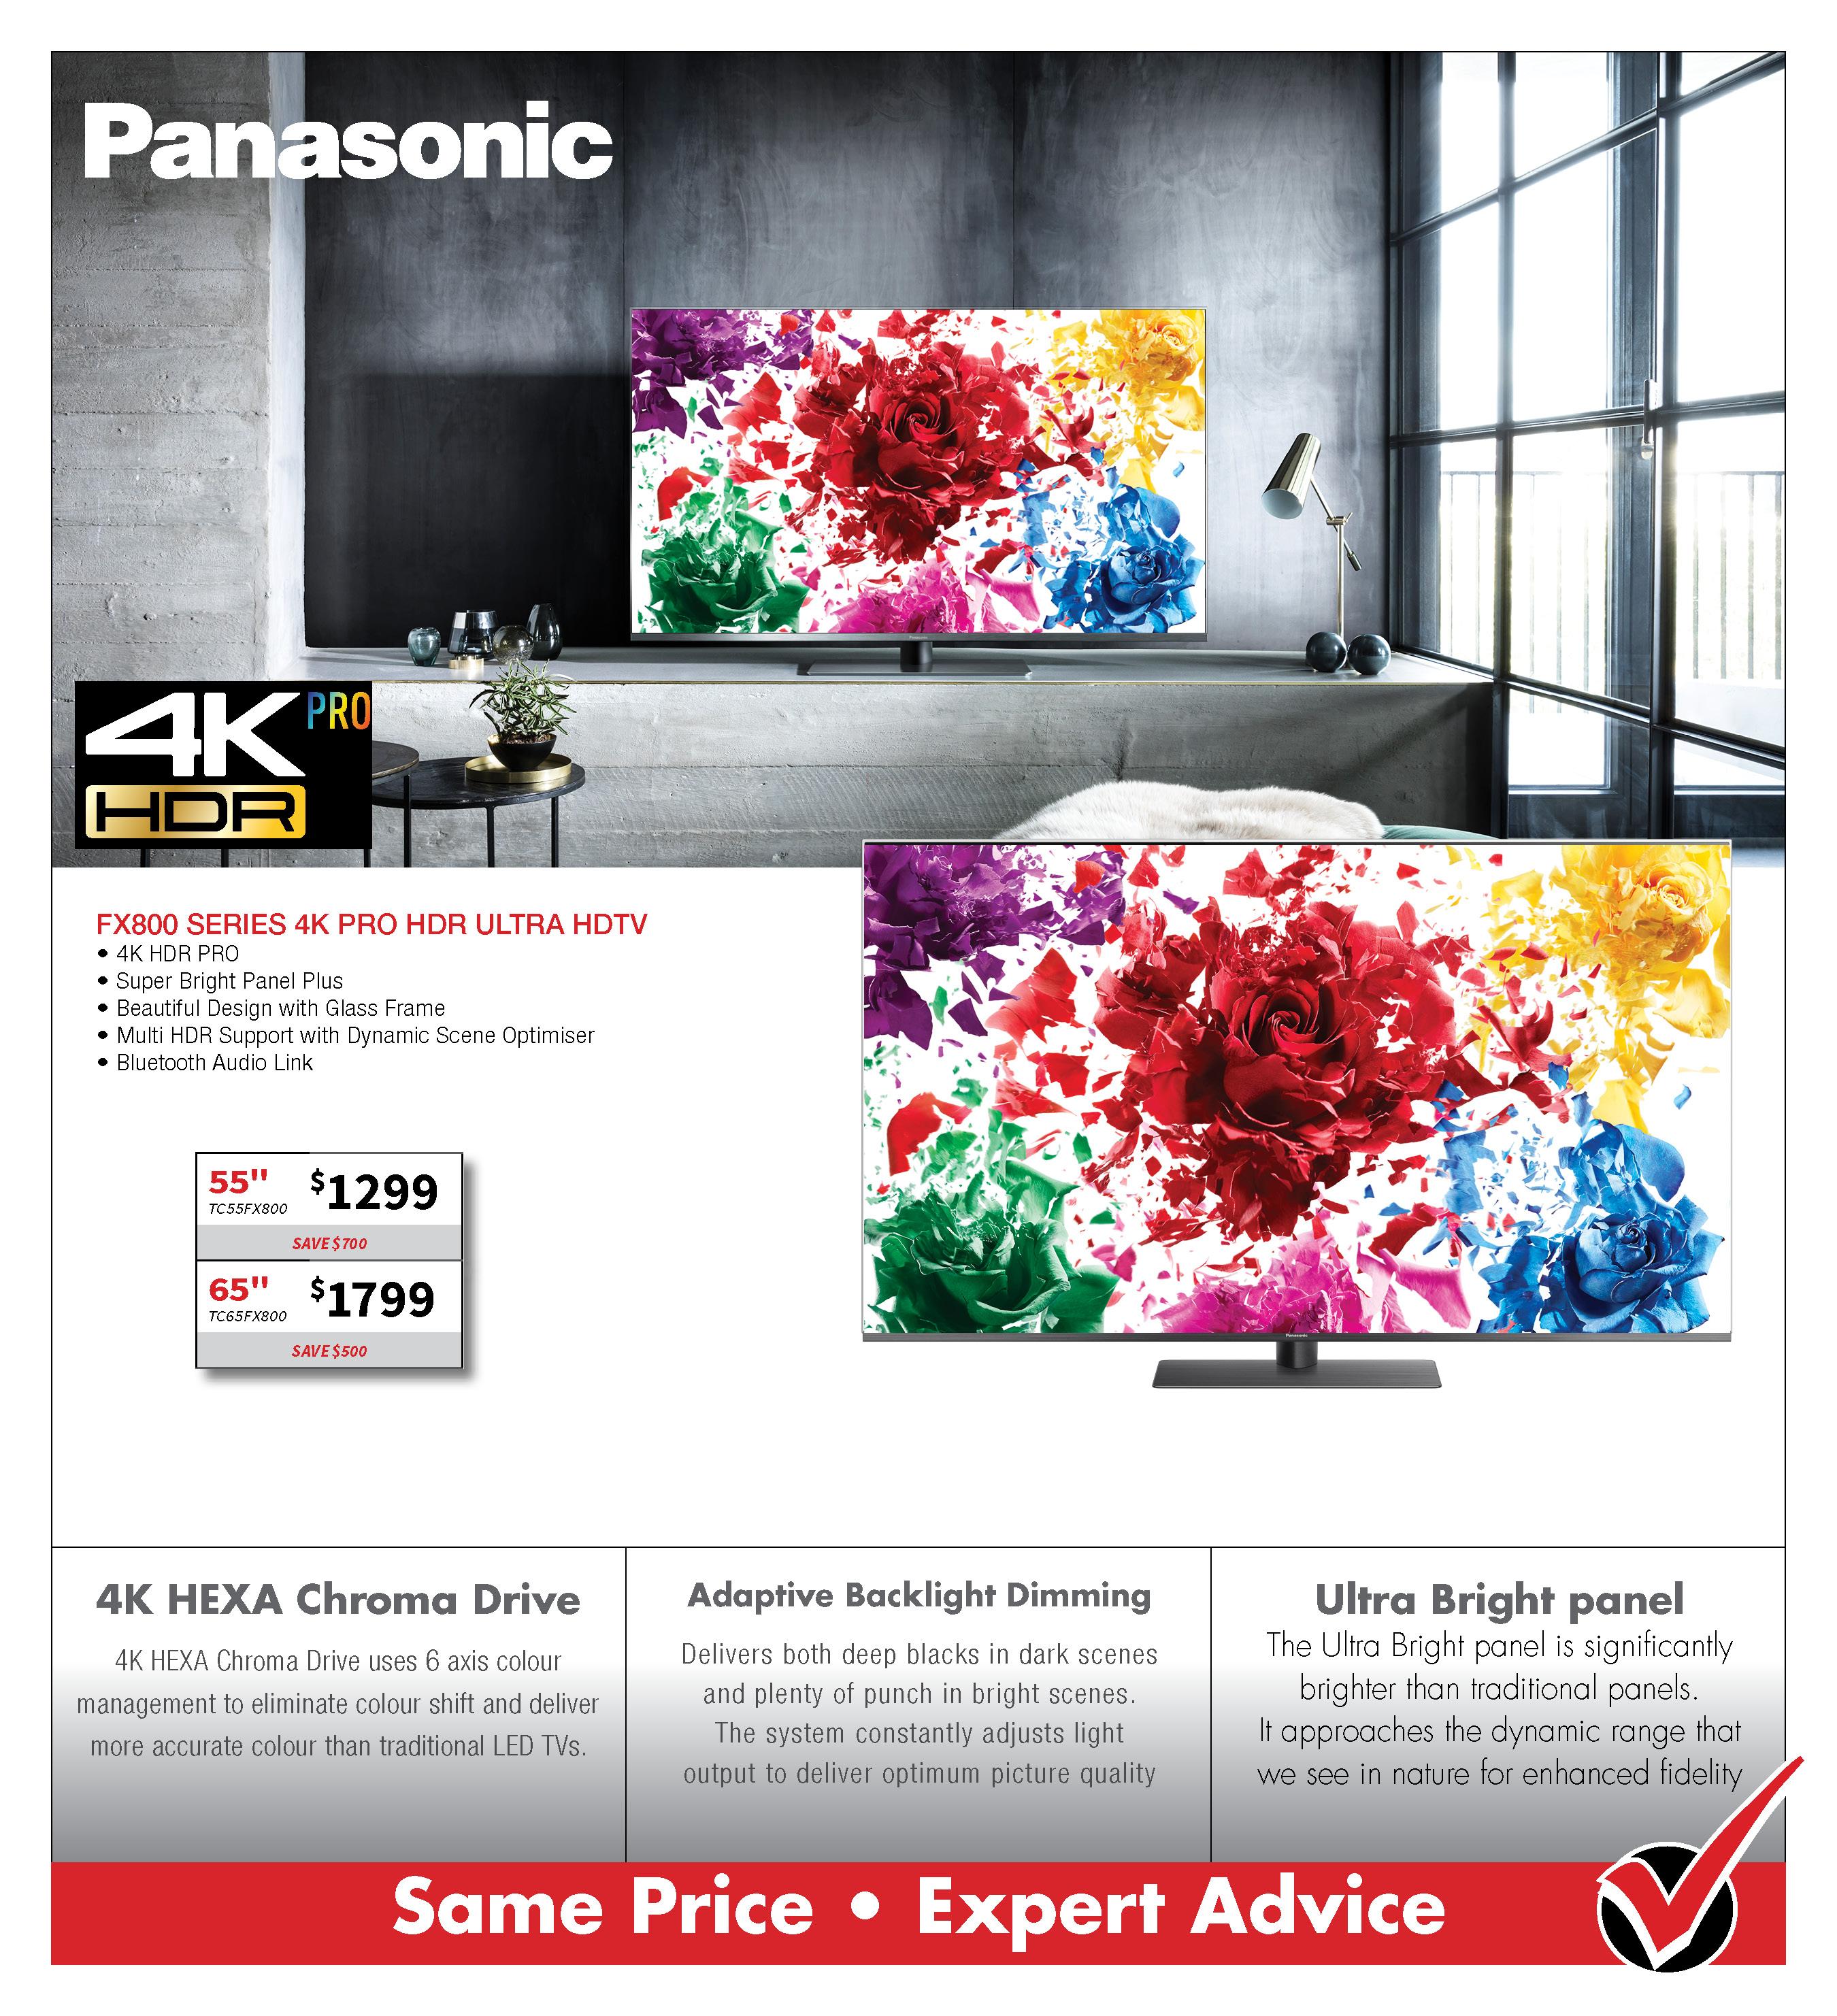 PANASONIC FX800 4K HDTV